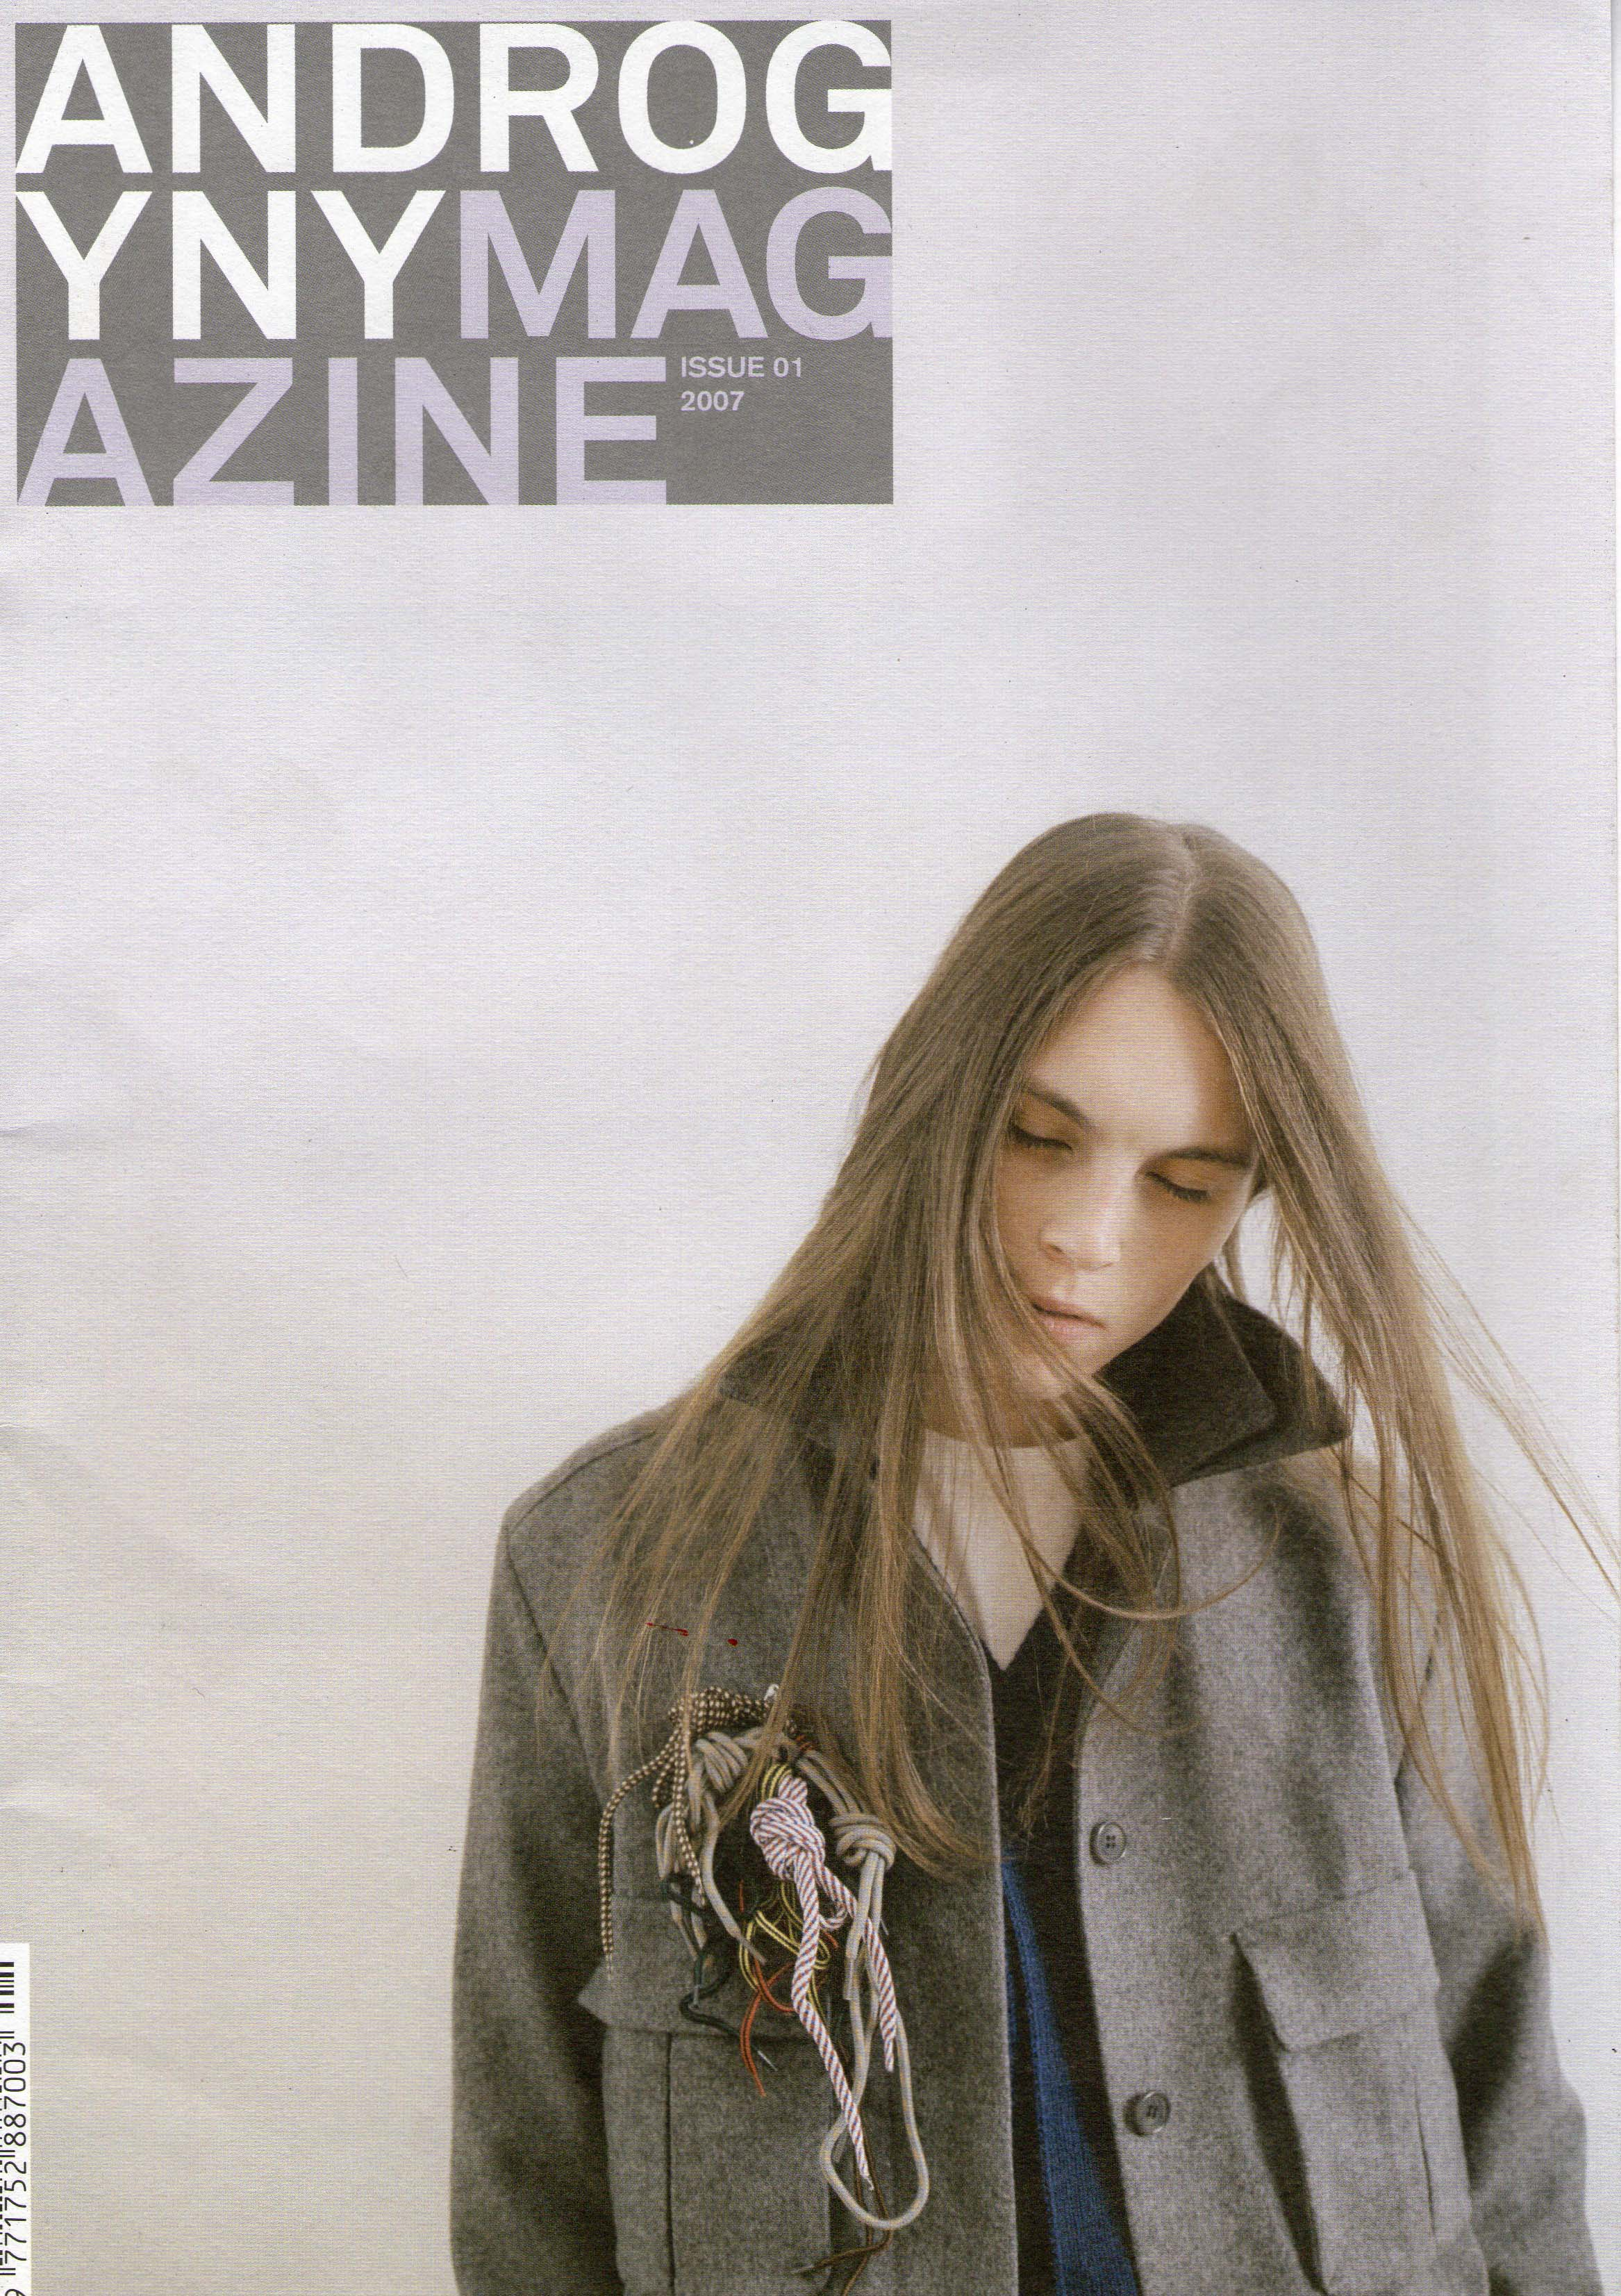 Androgeny Magazine issue 01 2007.jpg